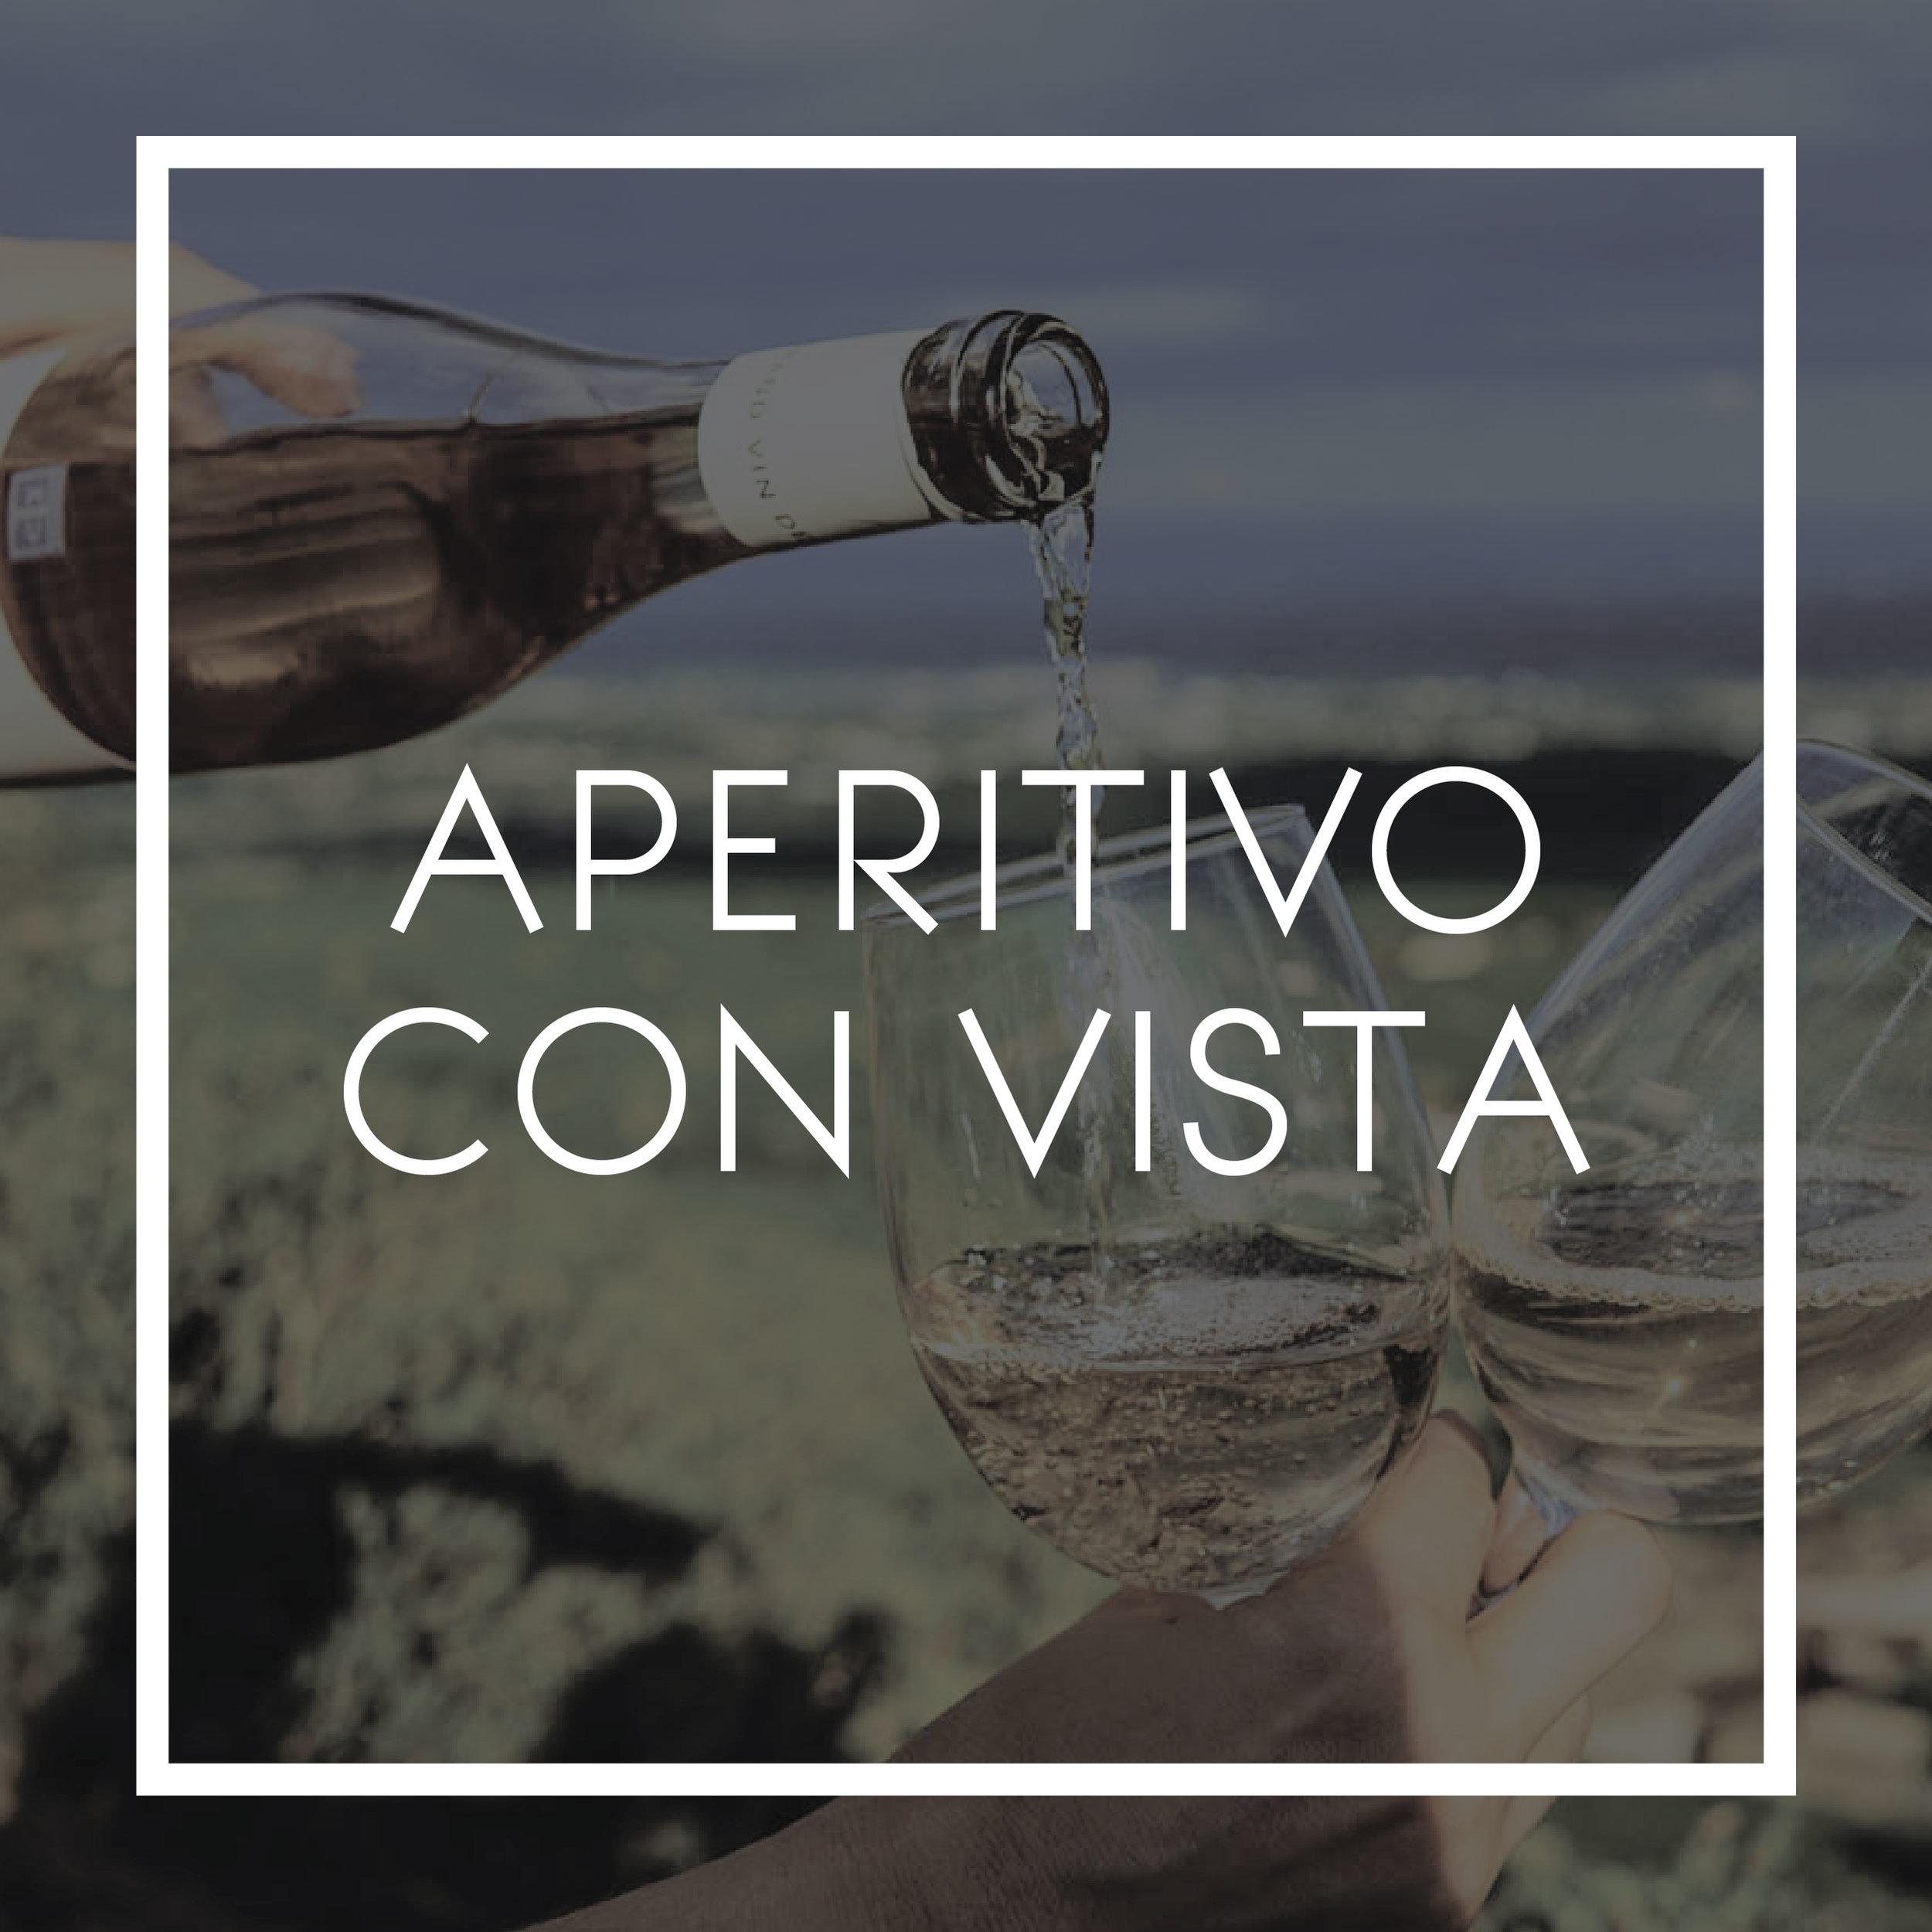 aperitivo_con_vista langhe roero.jpg